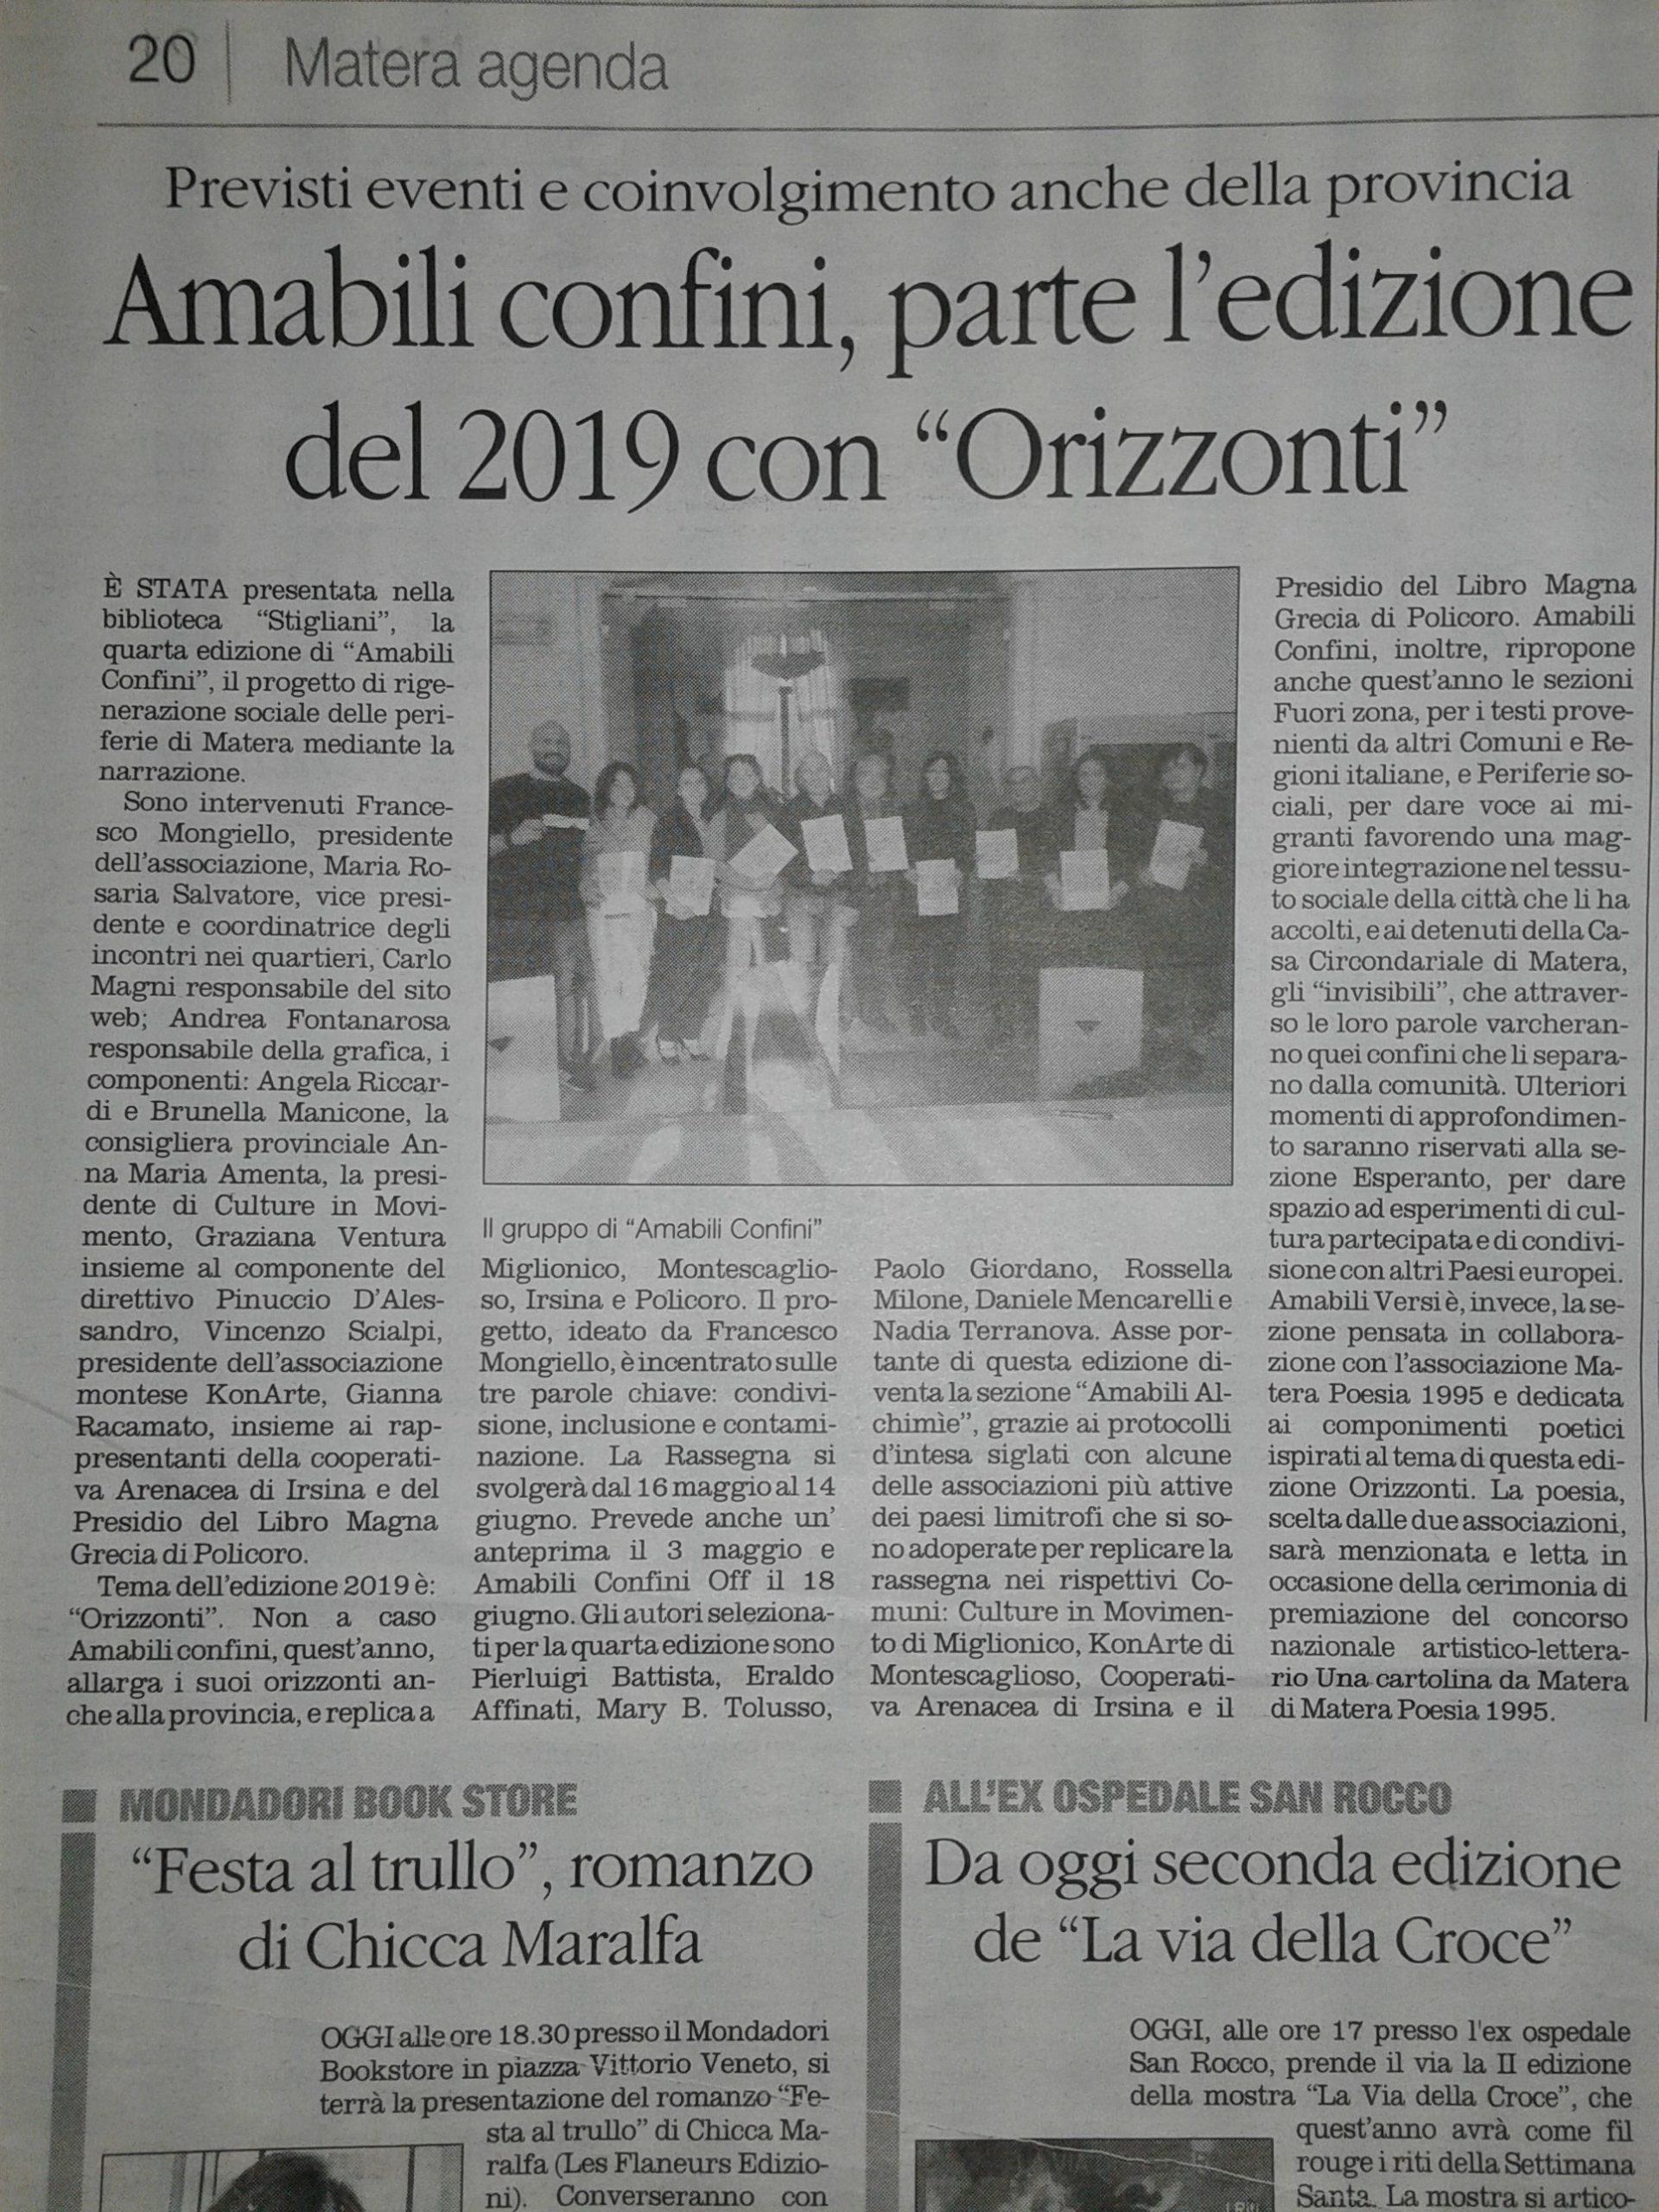 Amabili Confini 2019